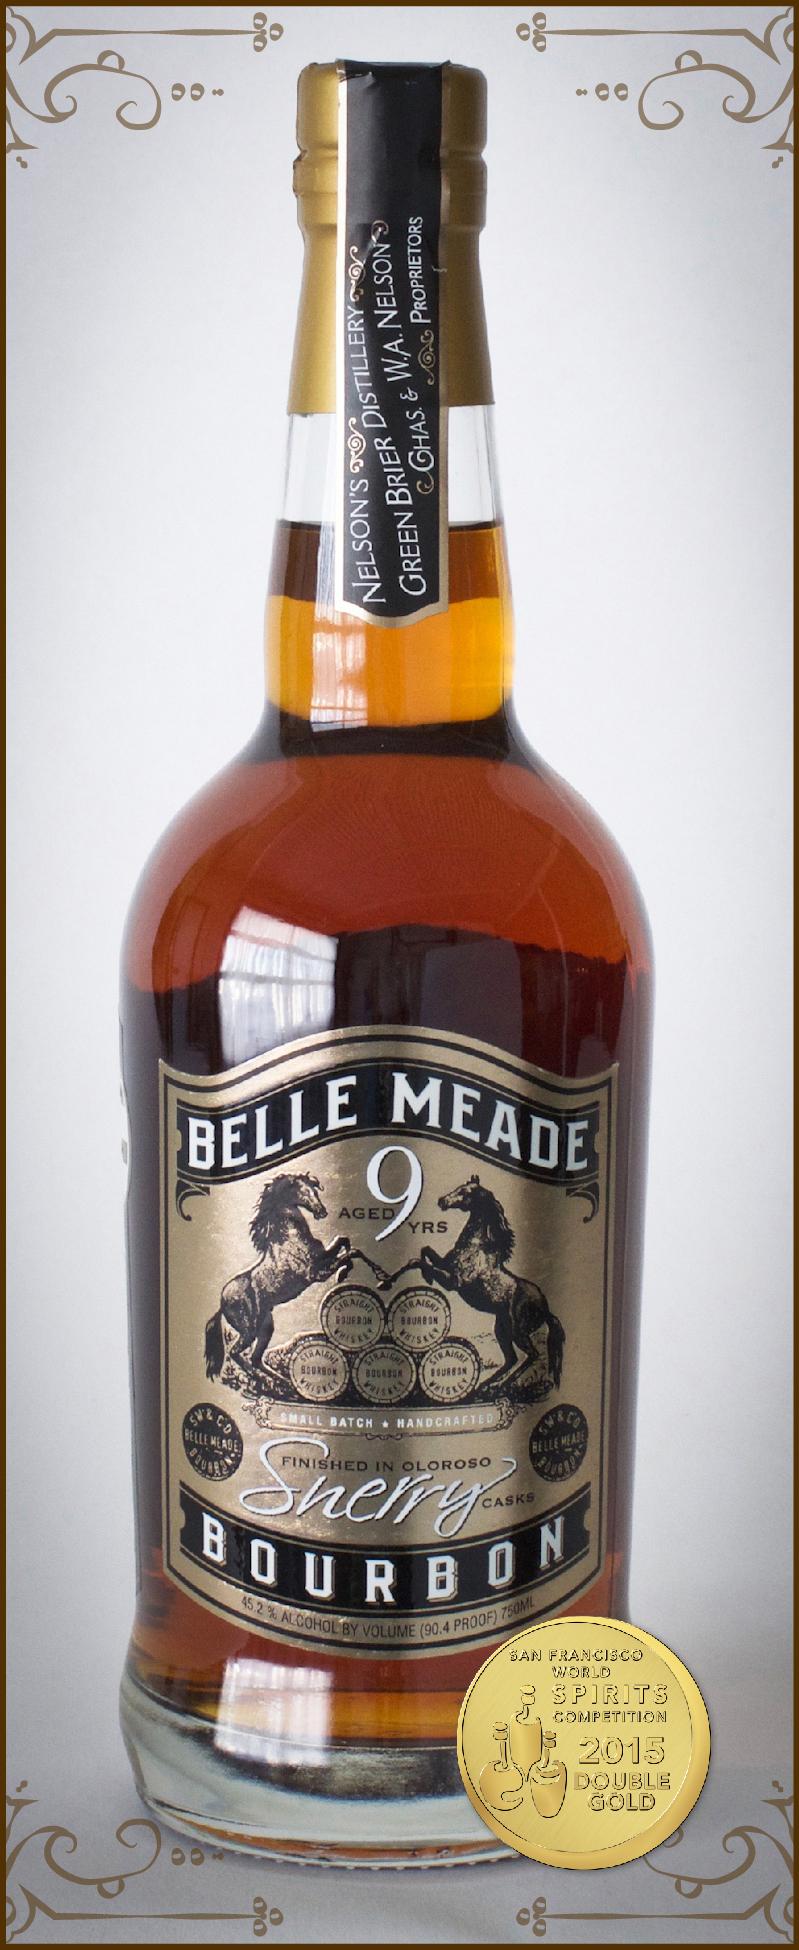 Belle Meade Bourbon Sherry Cask: Limited Release